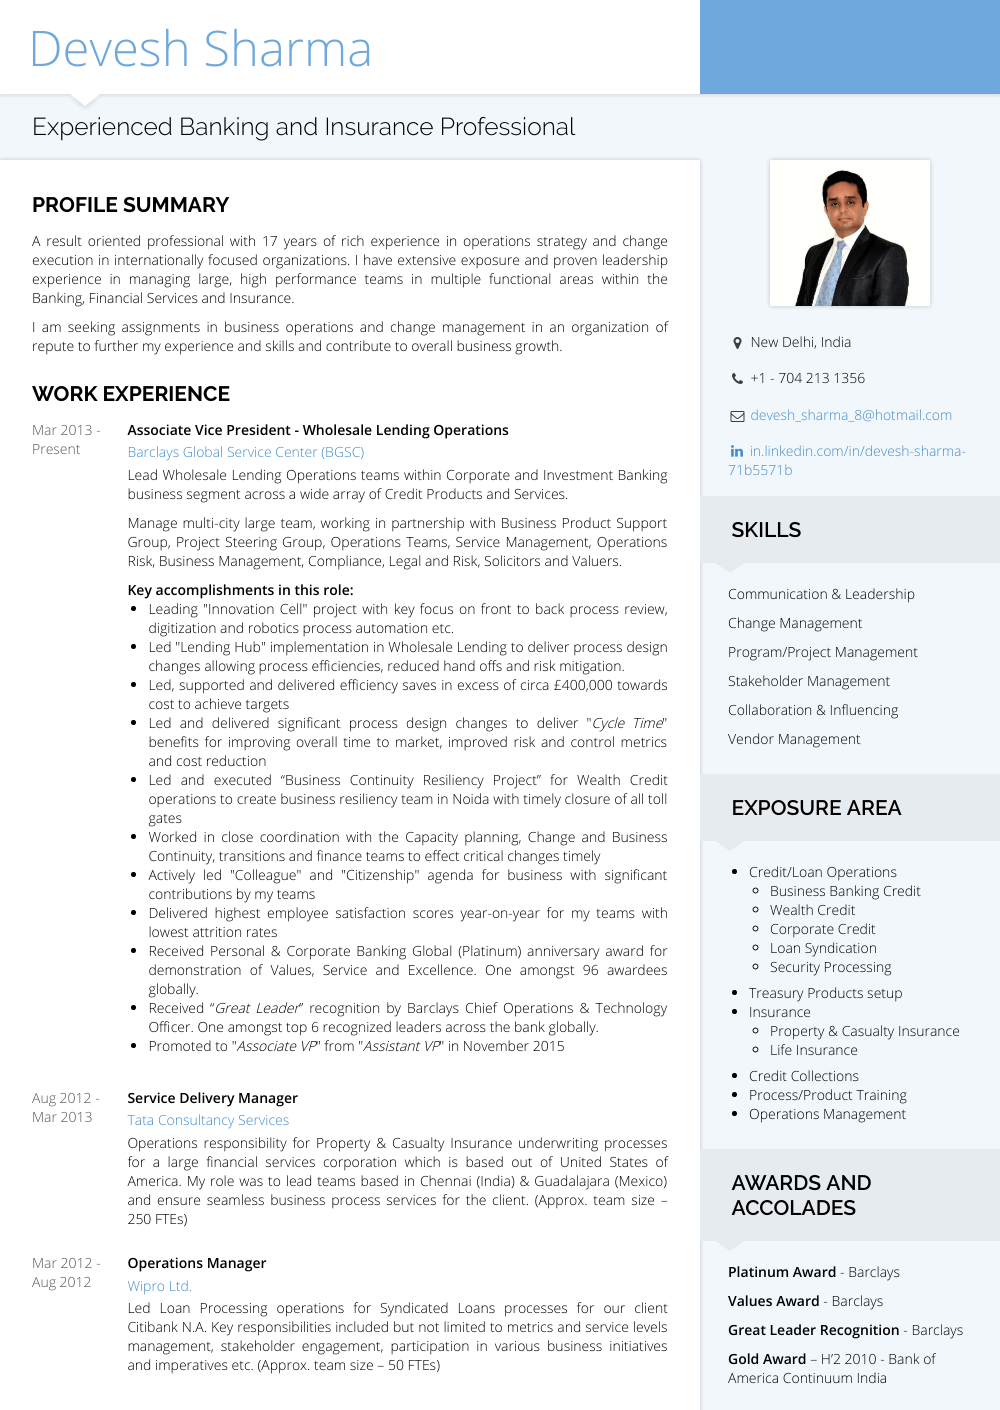 Associate Vice President - Resume Samples & Templates | VisualCV